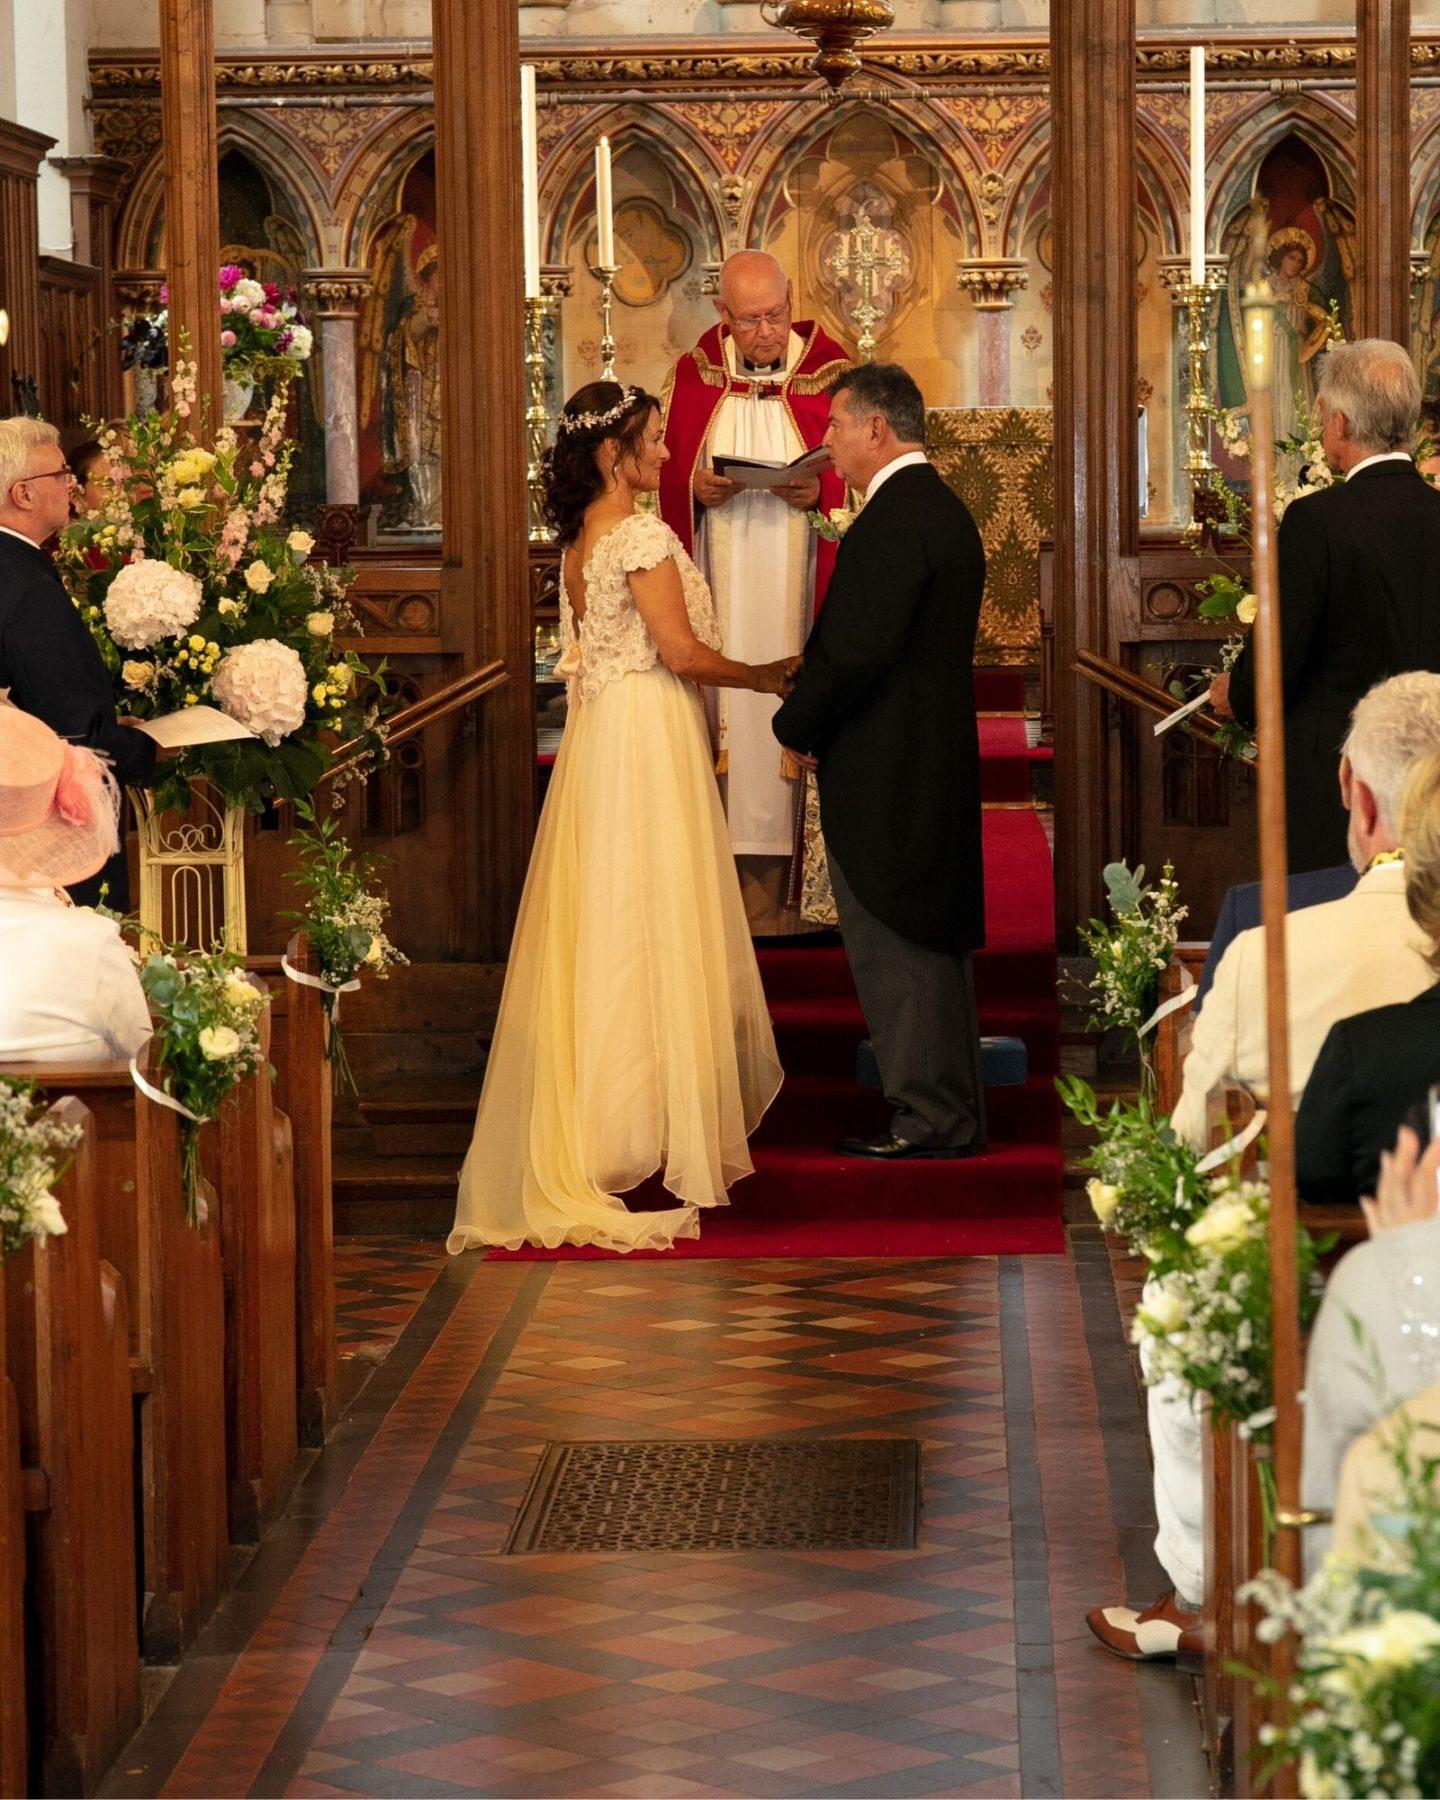 Bride wearing wedding dress from bridal shop in Stratford